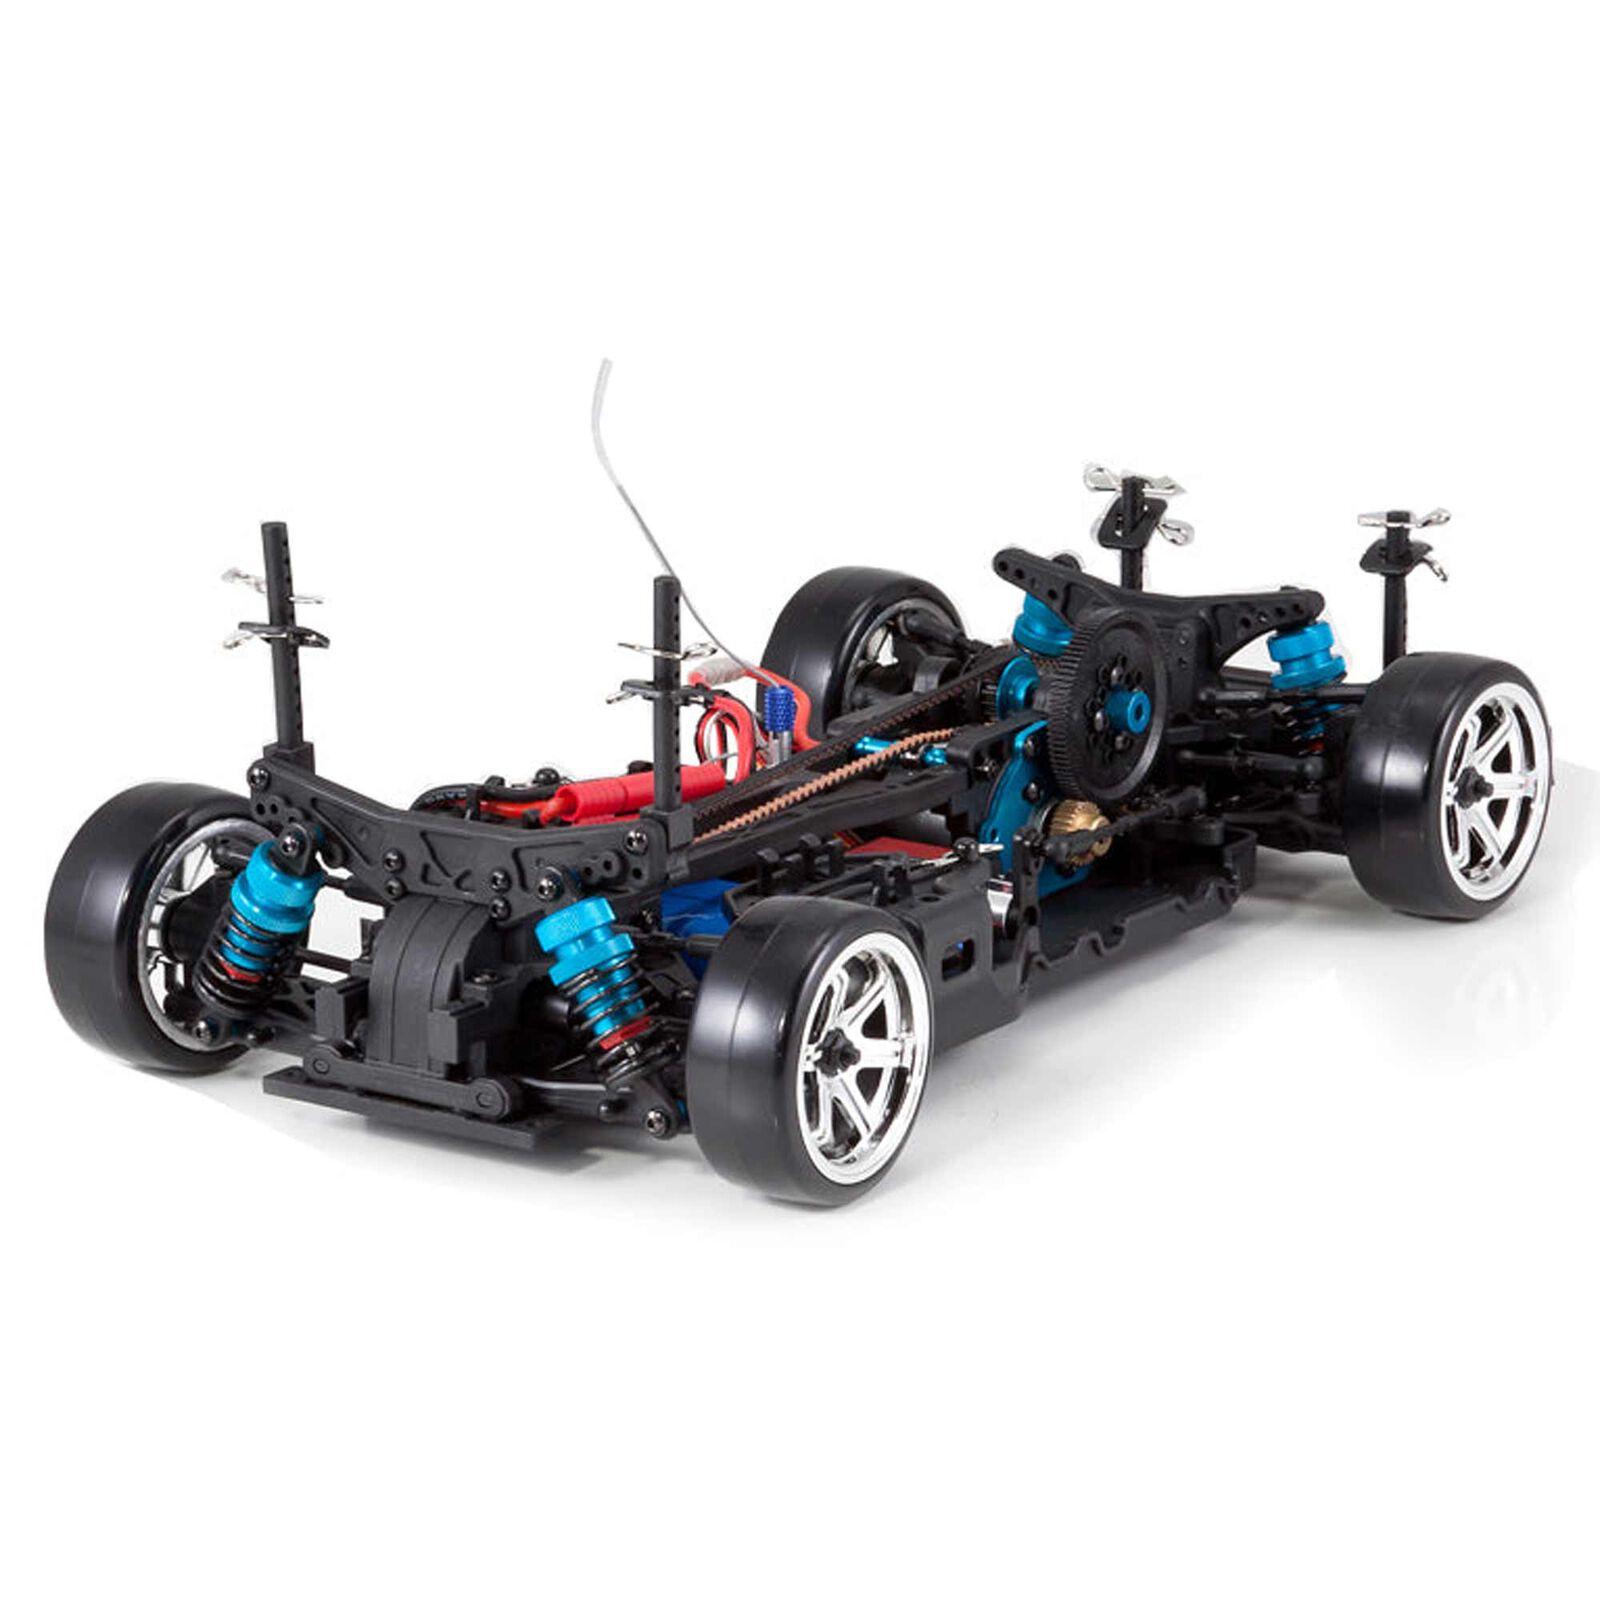 1/10 Thunder Drift 4WD Brushed RTR, Gunmetal